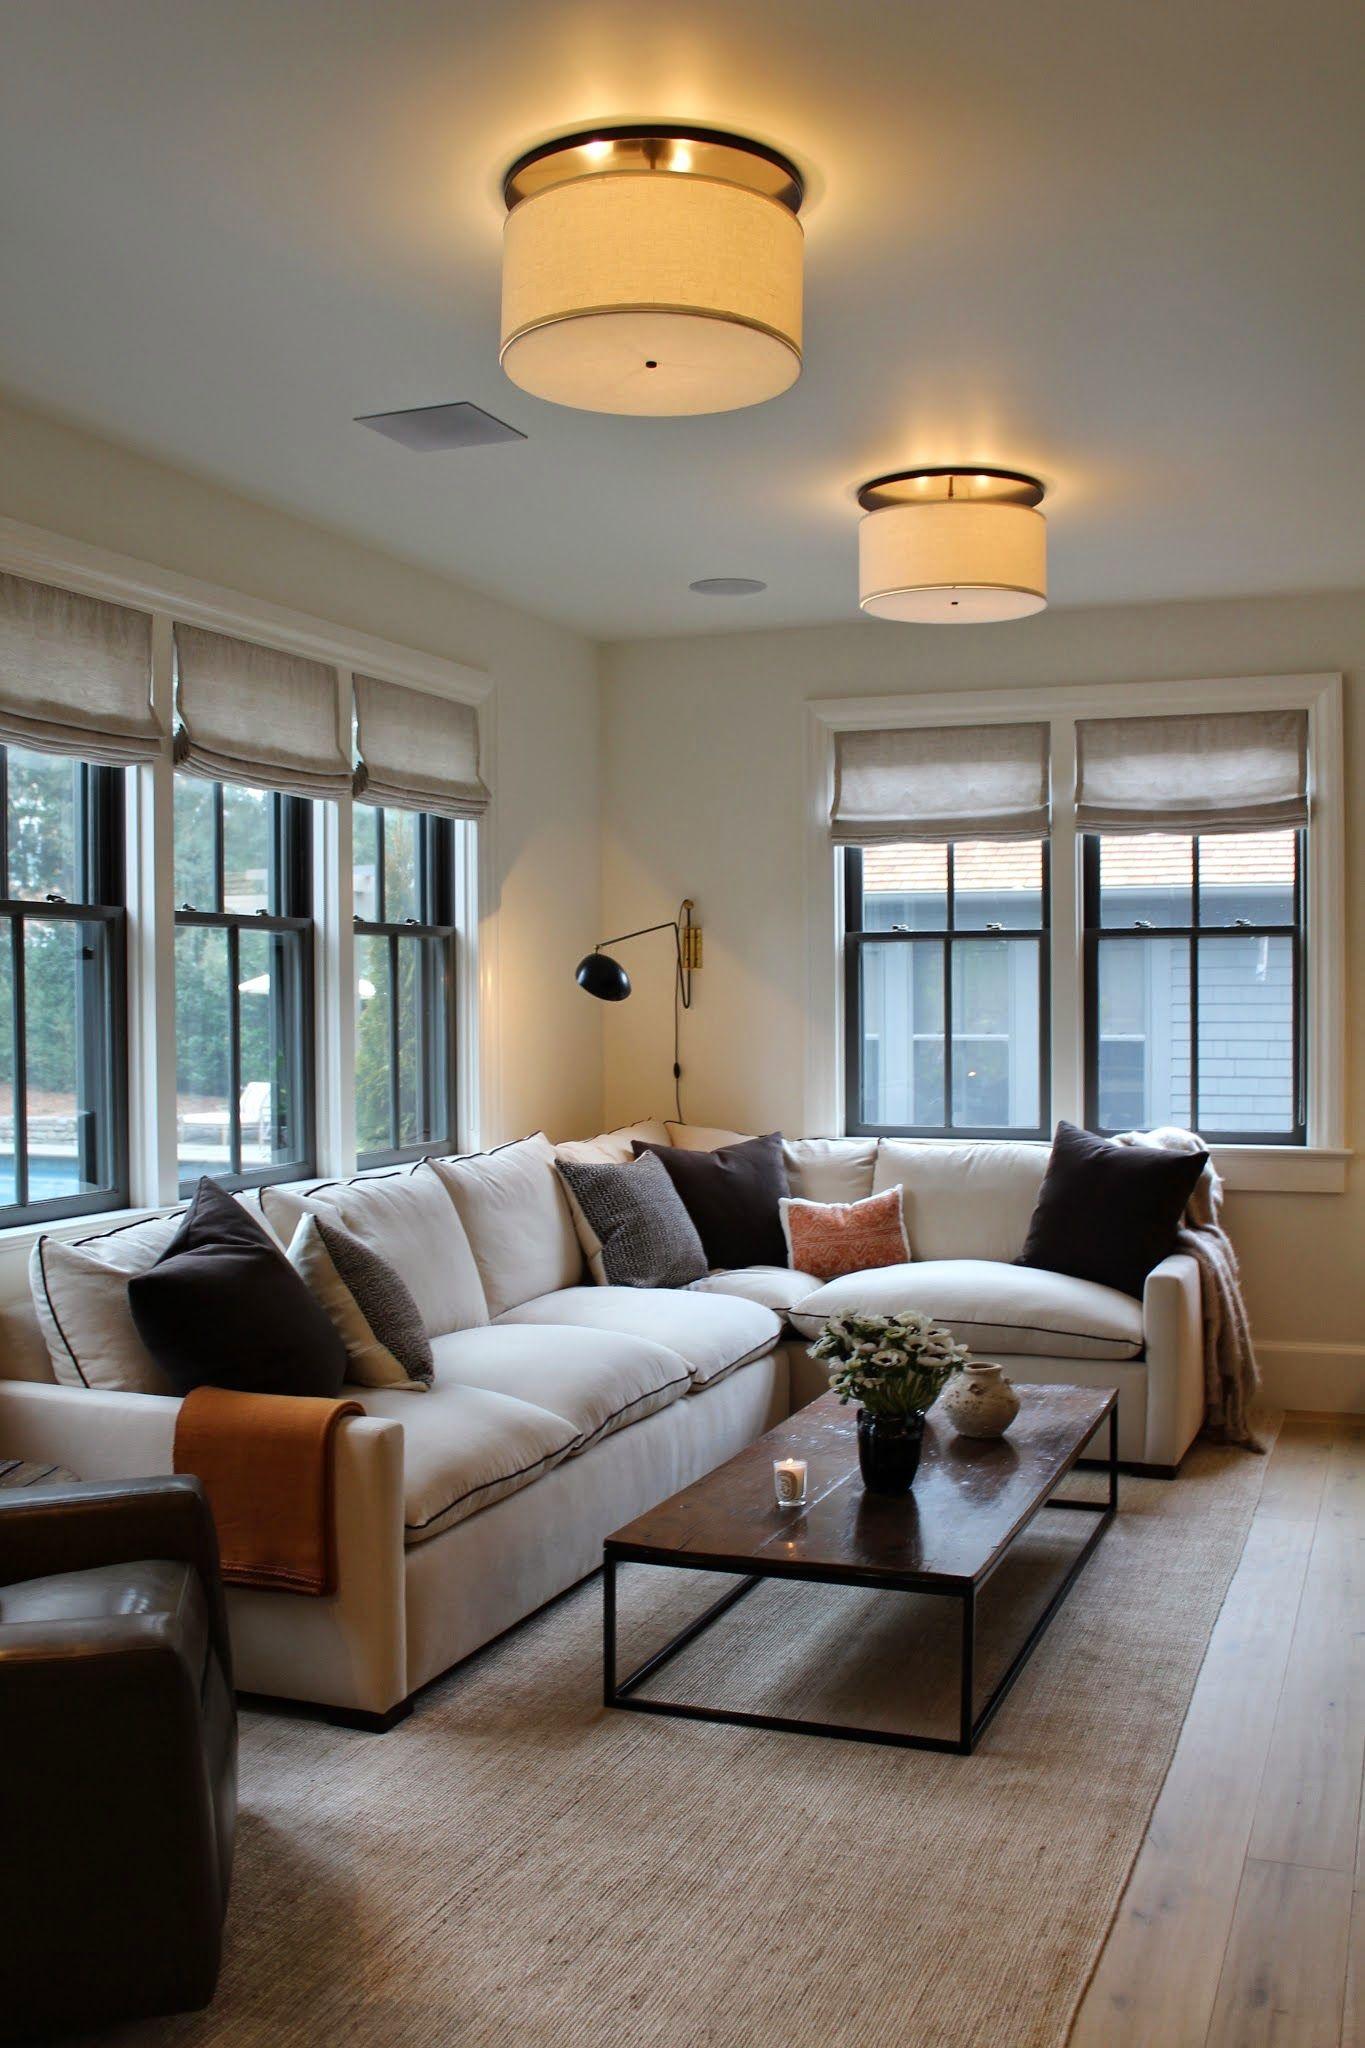 La Based Interior Design Firm With Images Interior Design